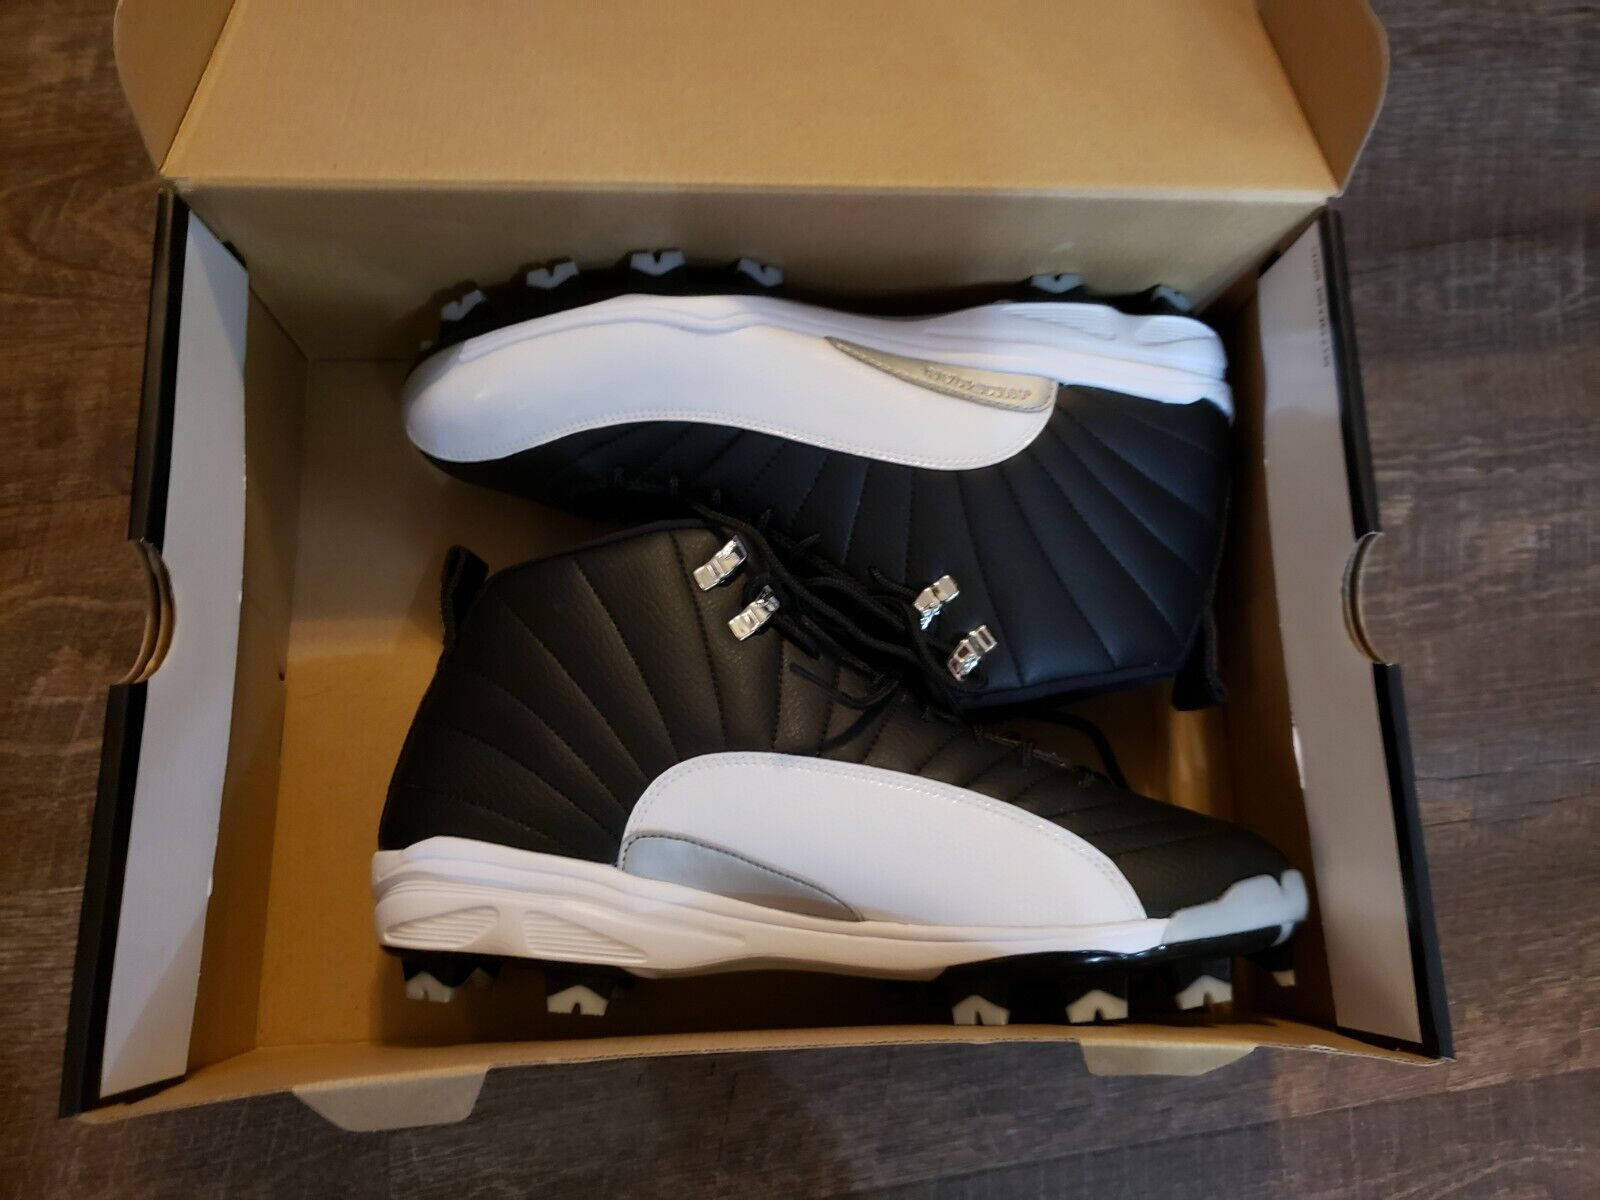 Nike Air Jordan Retro XII Cleats Playoff MCS 625219-001 Mens Sz. 11.5 New In Box